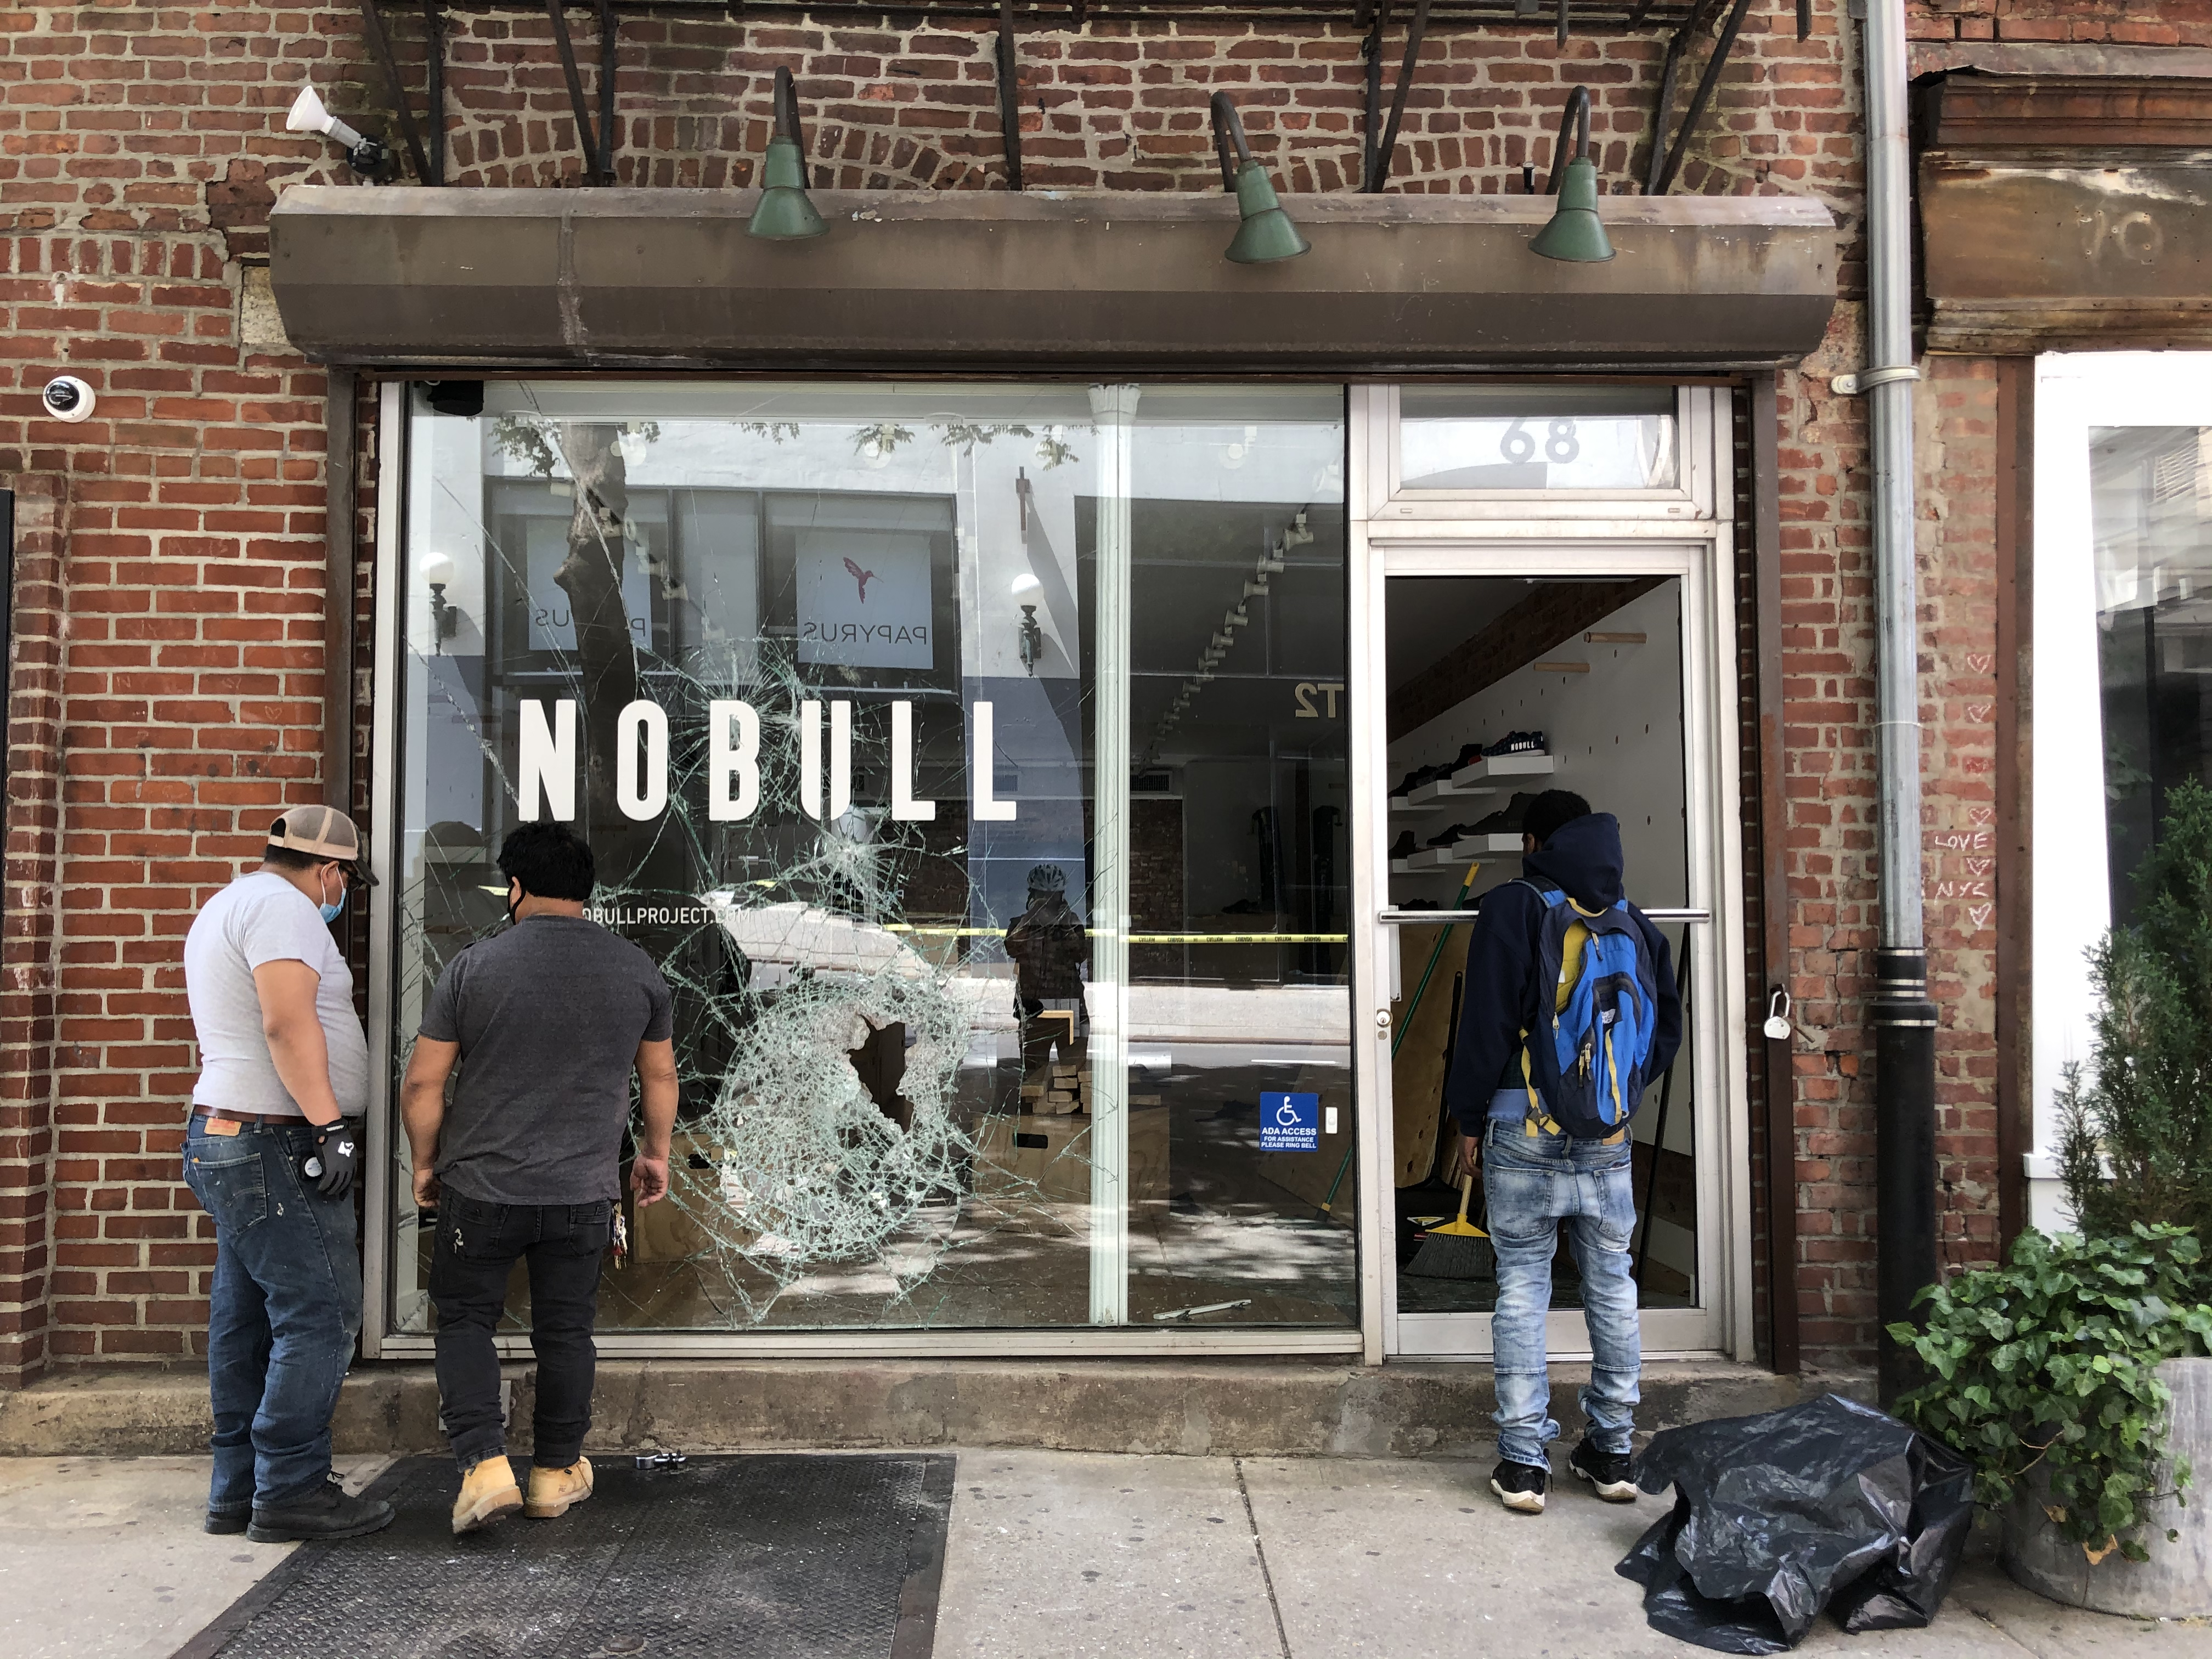 nobull store near me